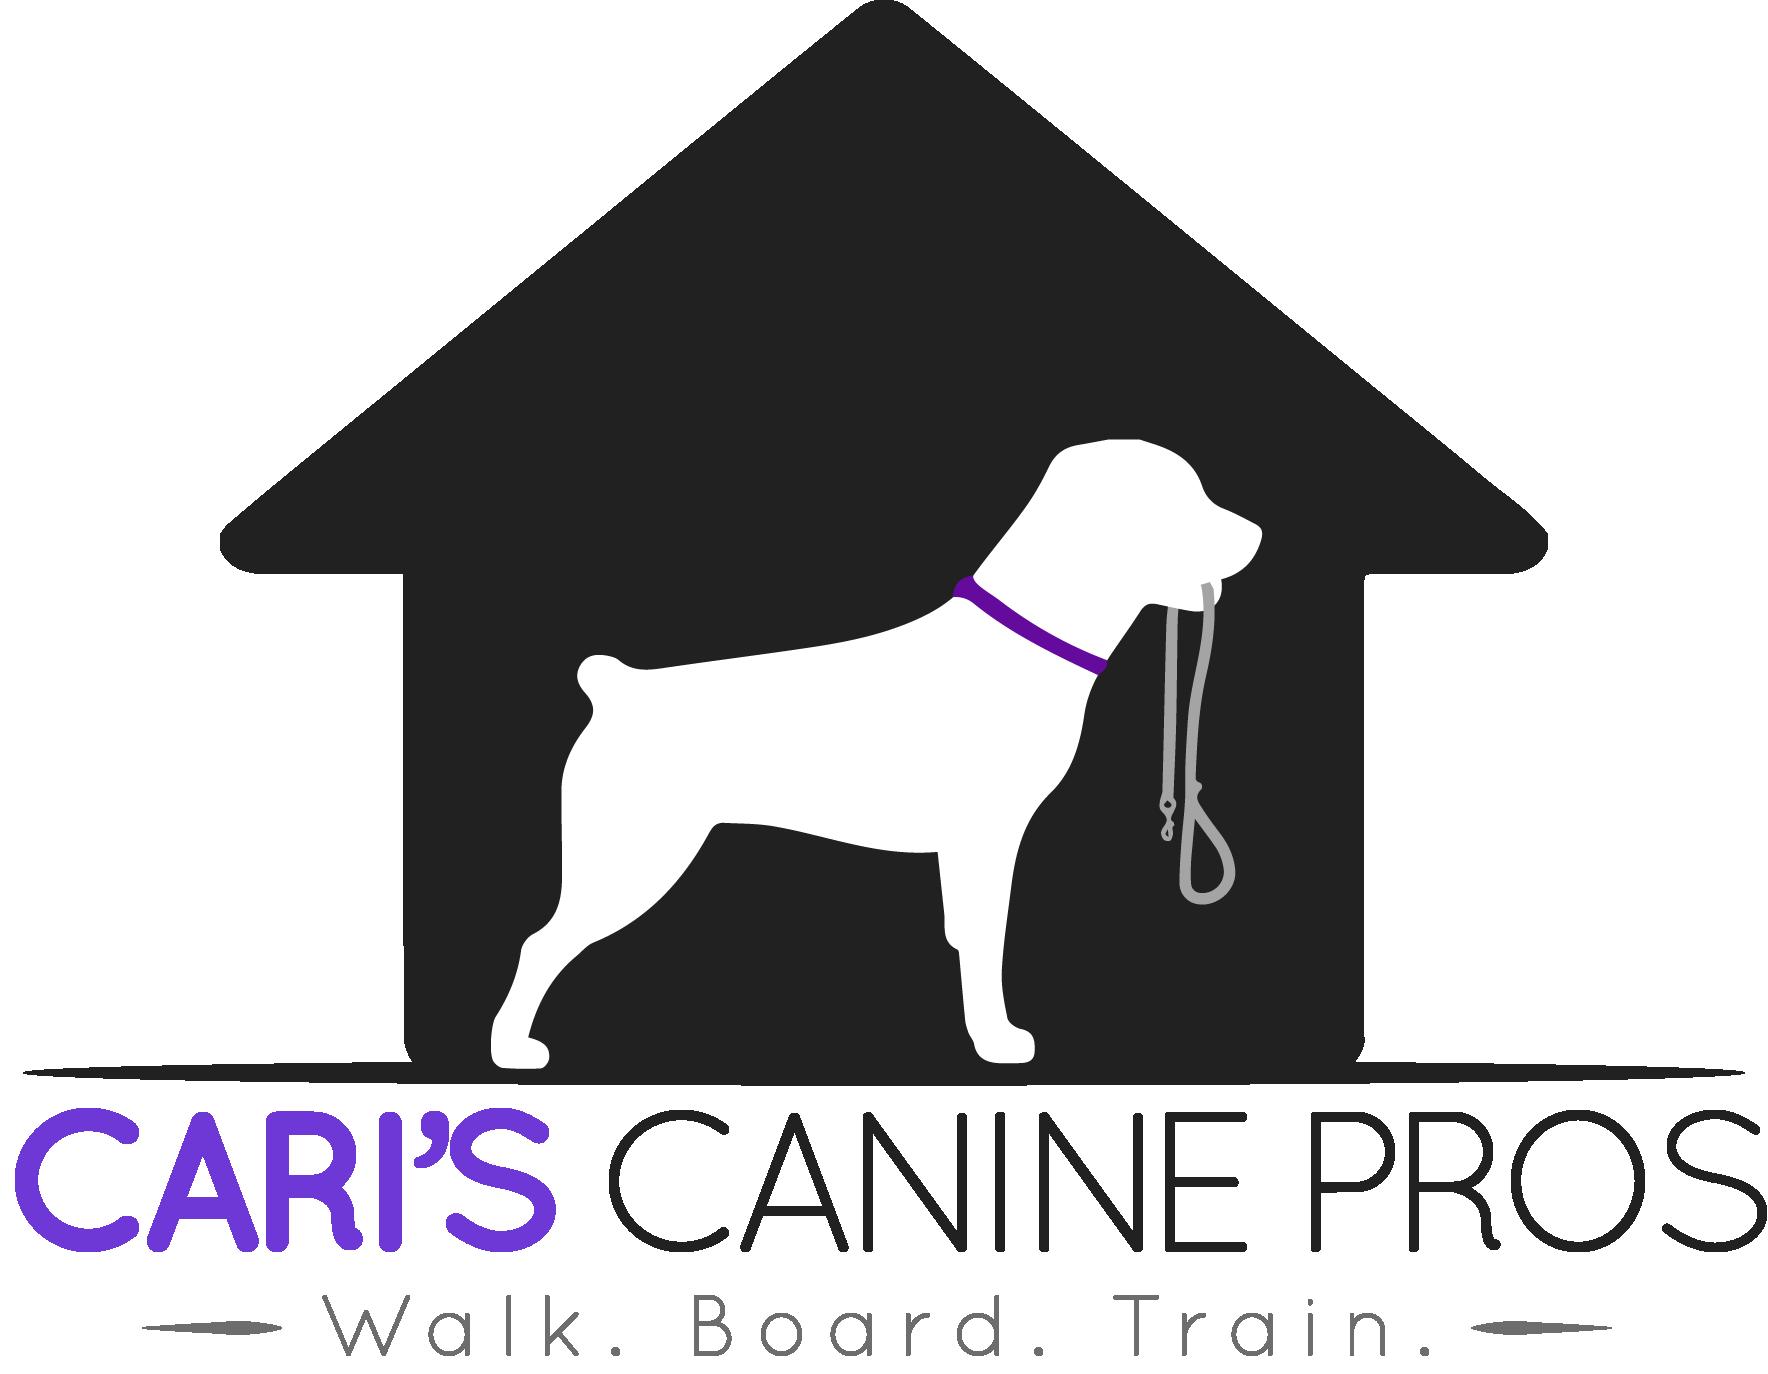 Cari's Canine Pros